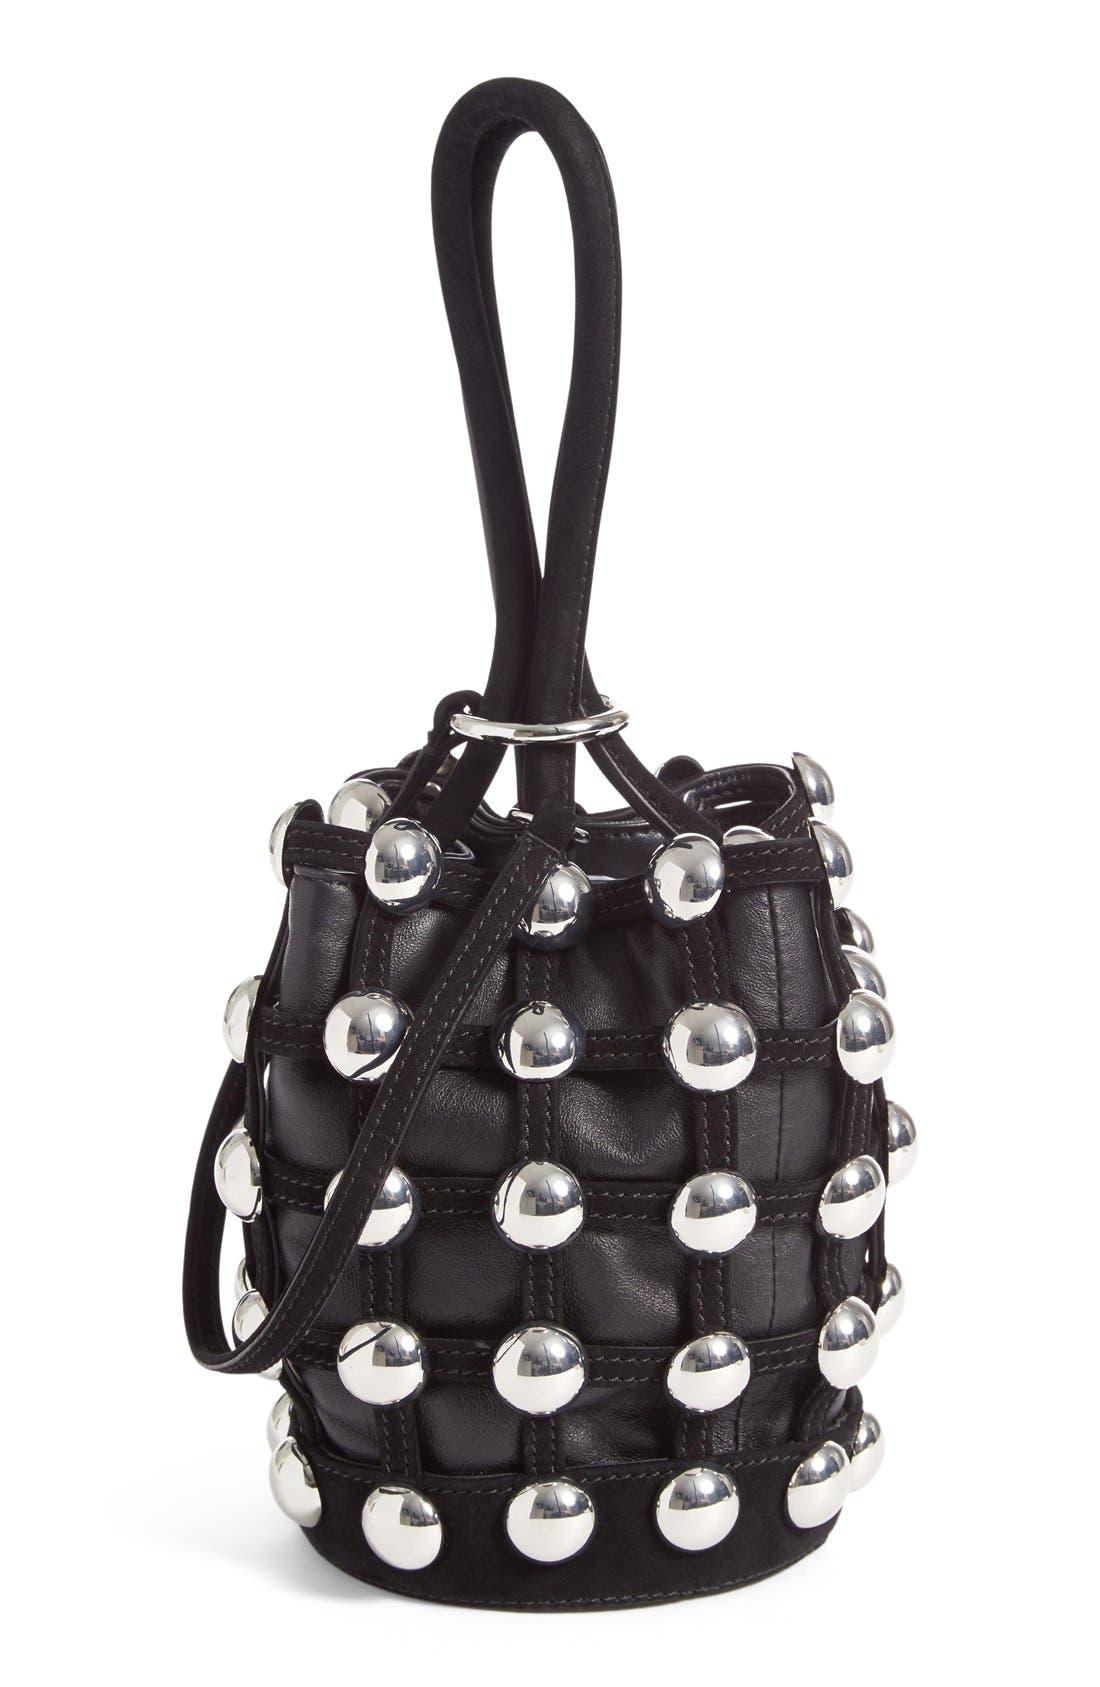 Alternate Image 1 Selected - Alexander Wang Mini Roxy Studded Suede Bucket Bag